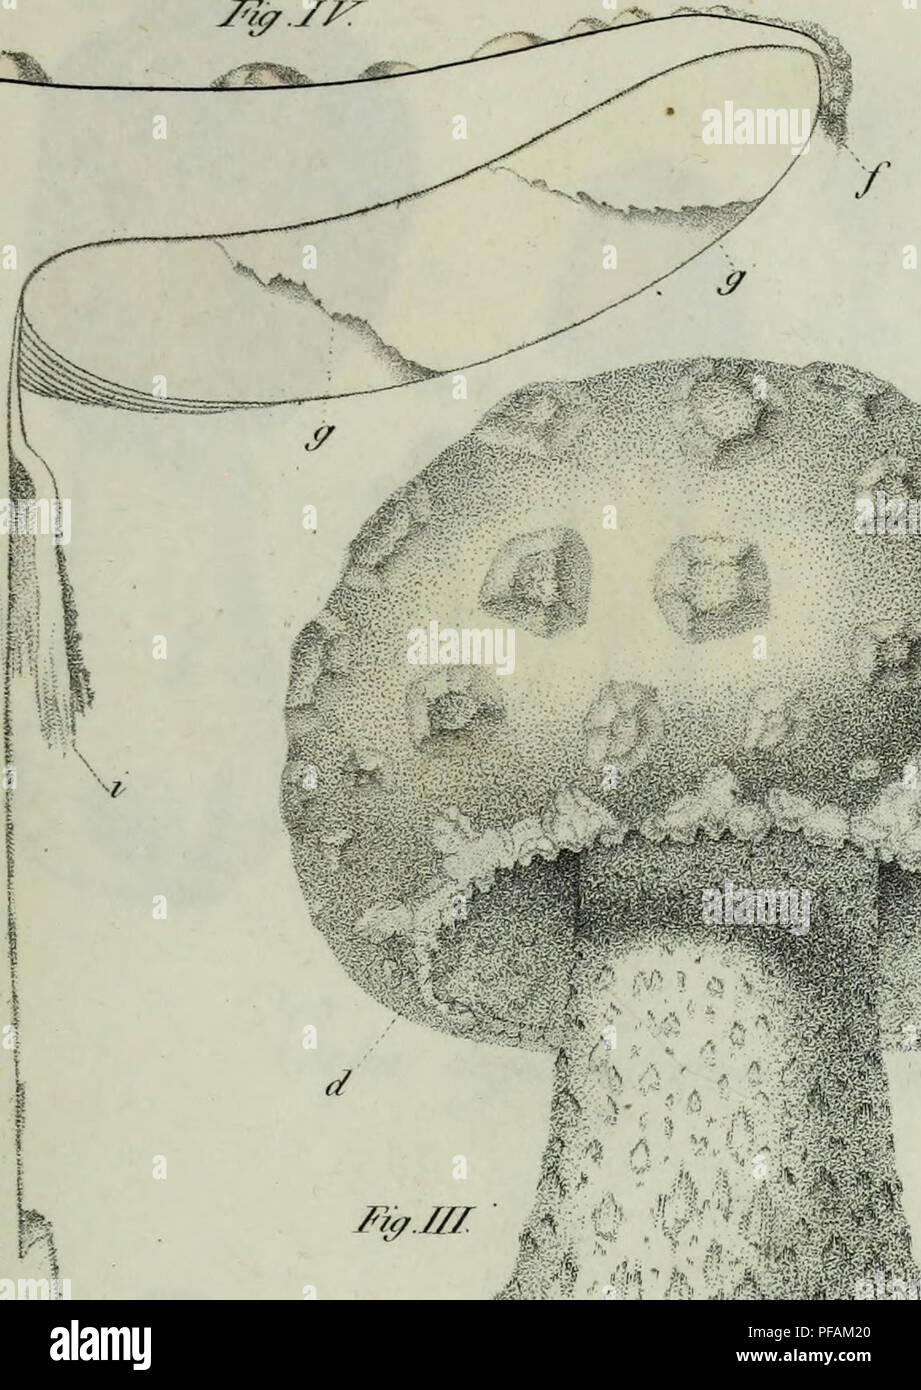 . Descrizione dei funghi mangerecci più comuni dell'Italia e de' velenosi che possono co' medesimi confondersi. Fungi; Mushrooms. Zf. Tur.. Please note that these images are extracted from scanned page images that may have been digitally enhanced for readability - coloration and appearance of these illustrations may not perfectly resemble the original work.. Vittadini, Carlo; Cavagna Sangiuliani di Gualdana, Antonio, conte, 1843-1913, former owner. IU-R. Milano, Rusconi - Stock Image